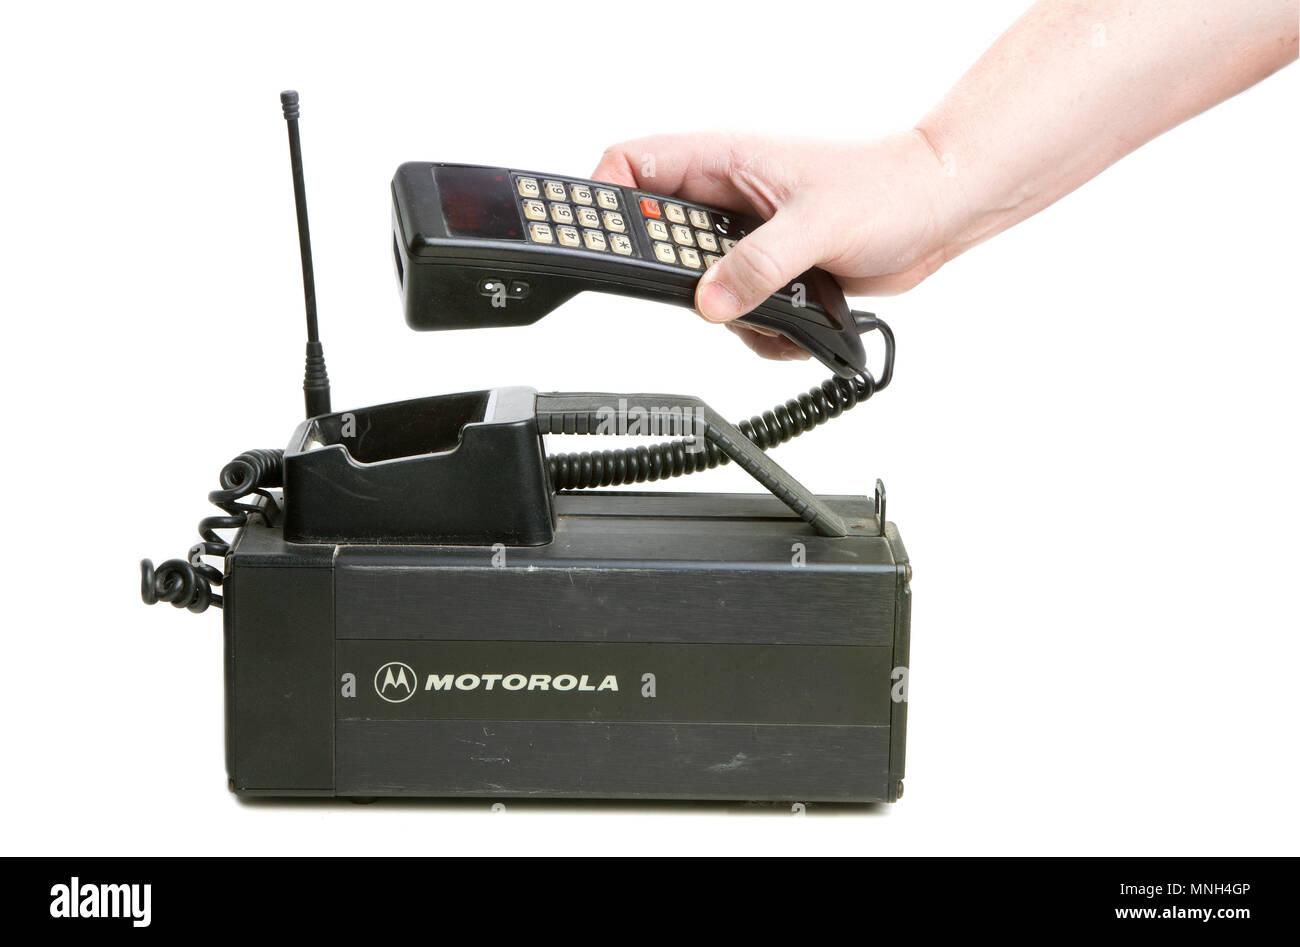 Hallstahammar, Sweden - December 10, 2012: One hand holdning the receiver of a 1980s era Motorola MCR 9500XL mobilephone used in Sweden. - Stock Image